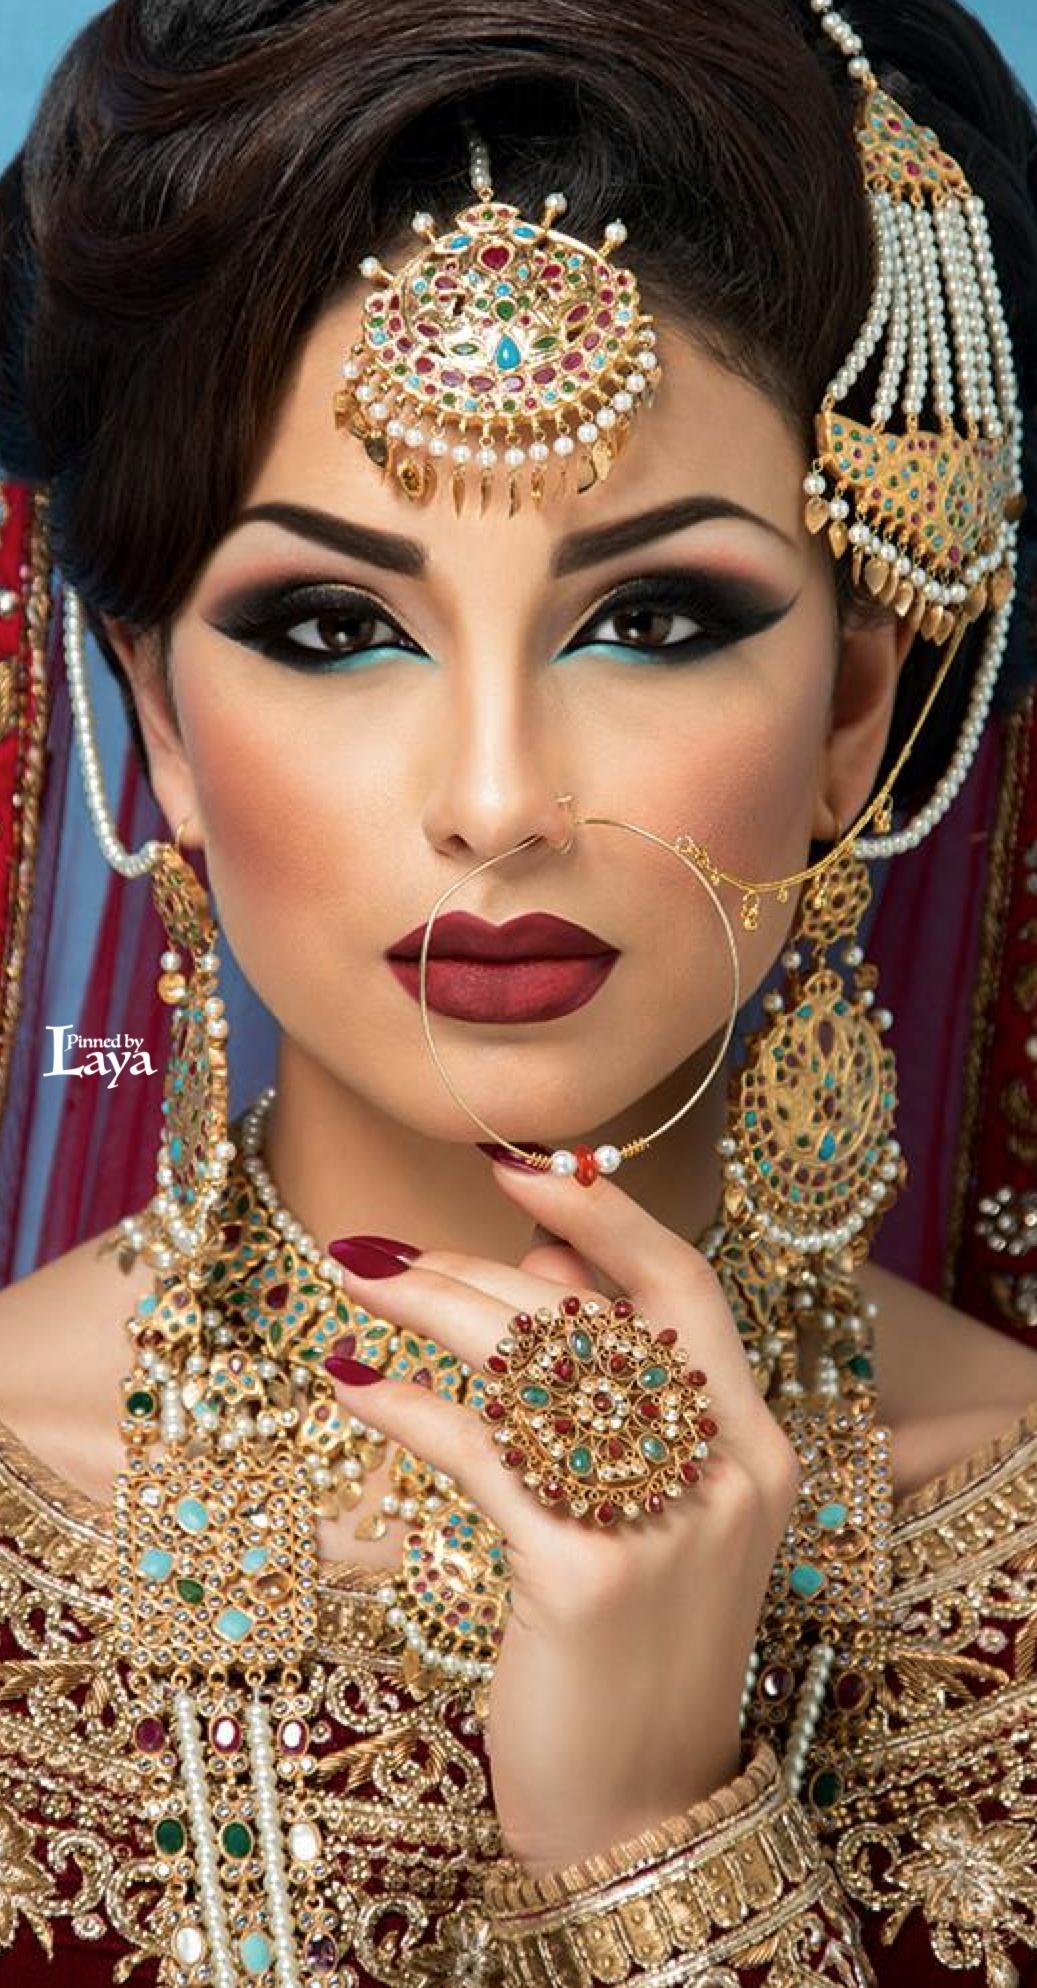 Pin By Label Shrena Hirawat On Beauty, Hair, Makeup | Indian Bridal pertaining to Indian Bridal Makeup Images